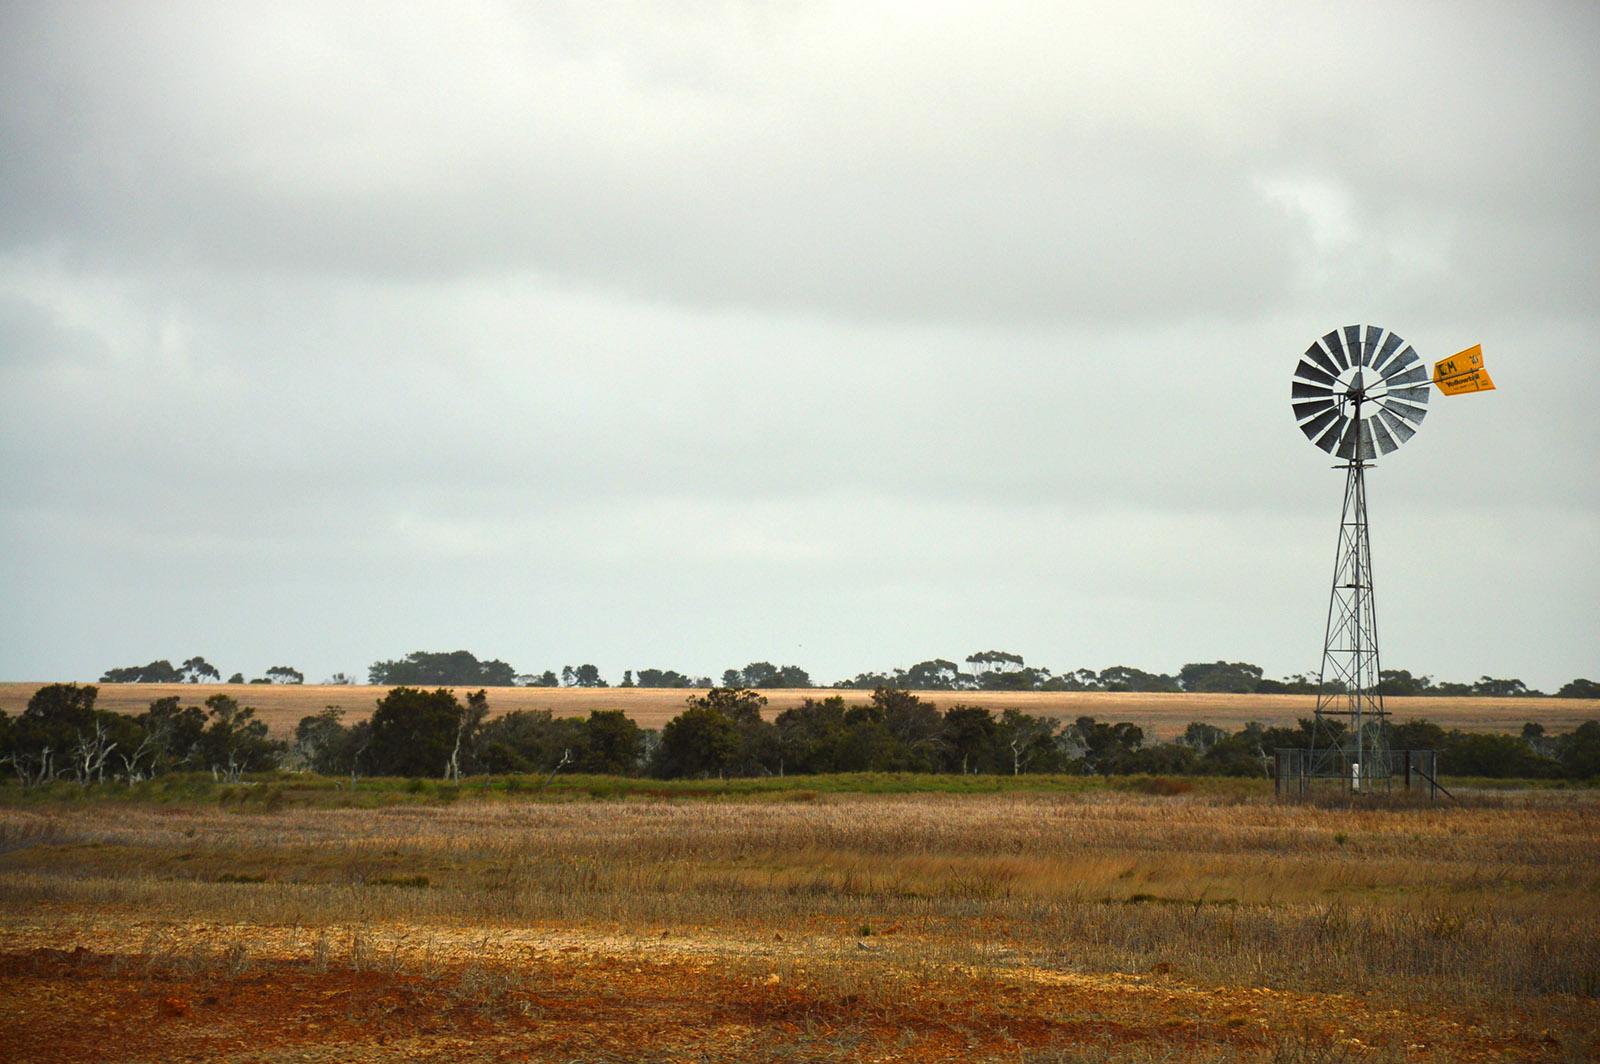 farm work experience in Australia